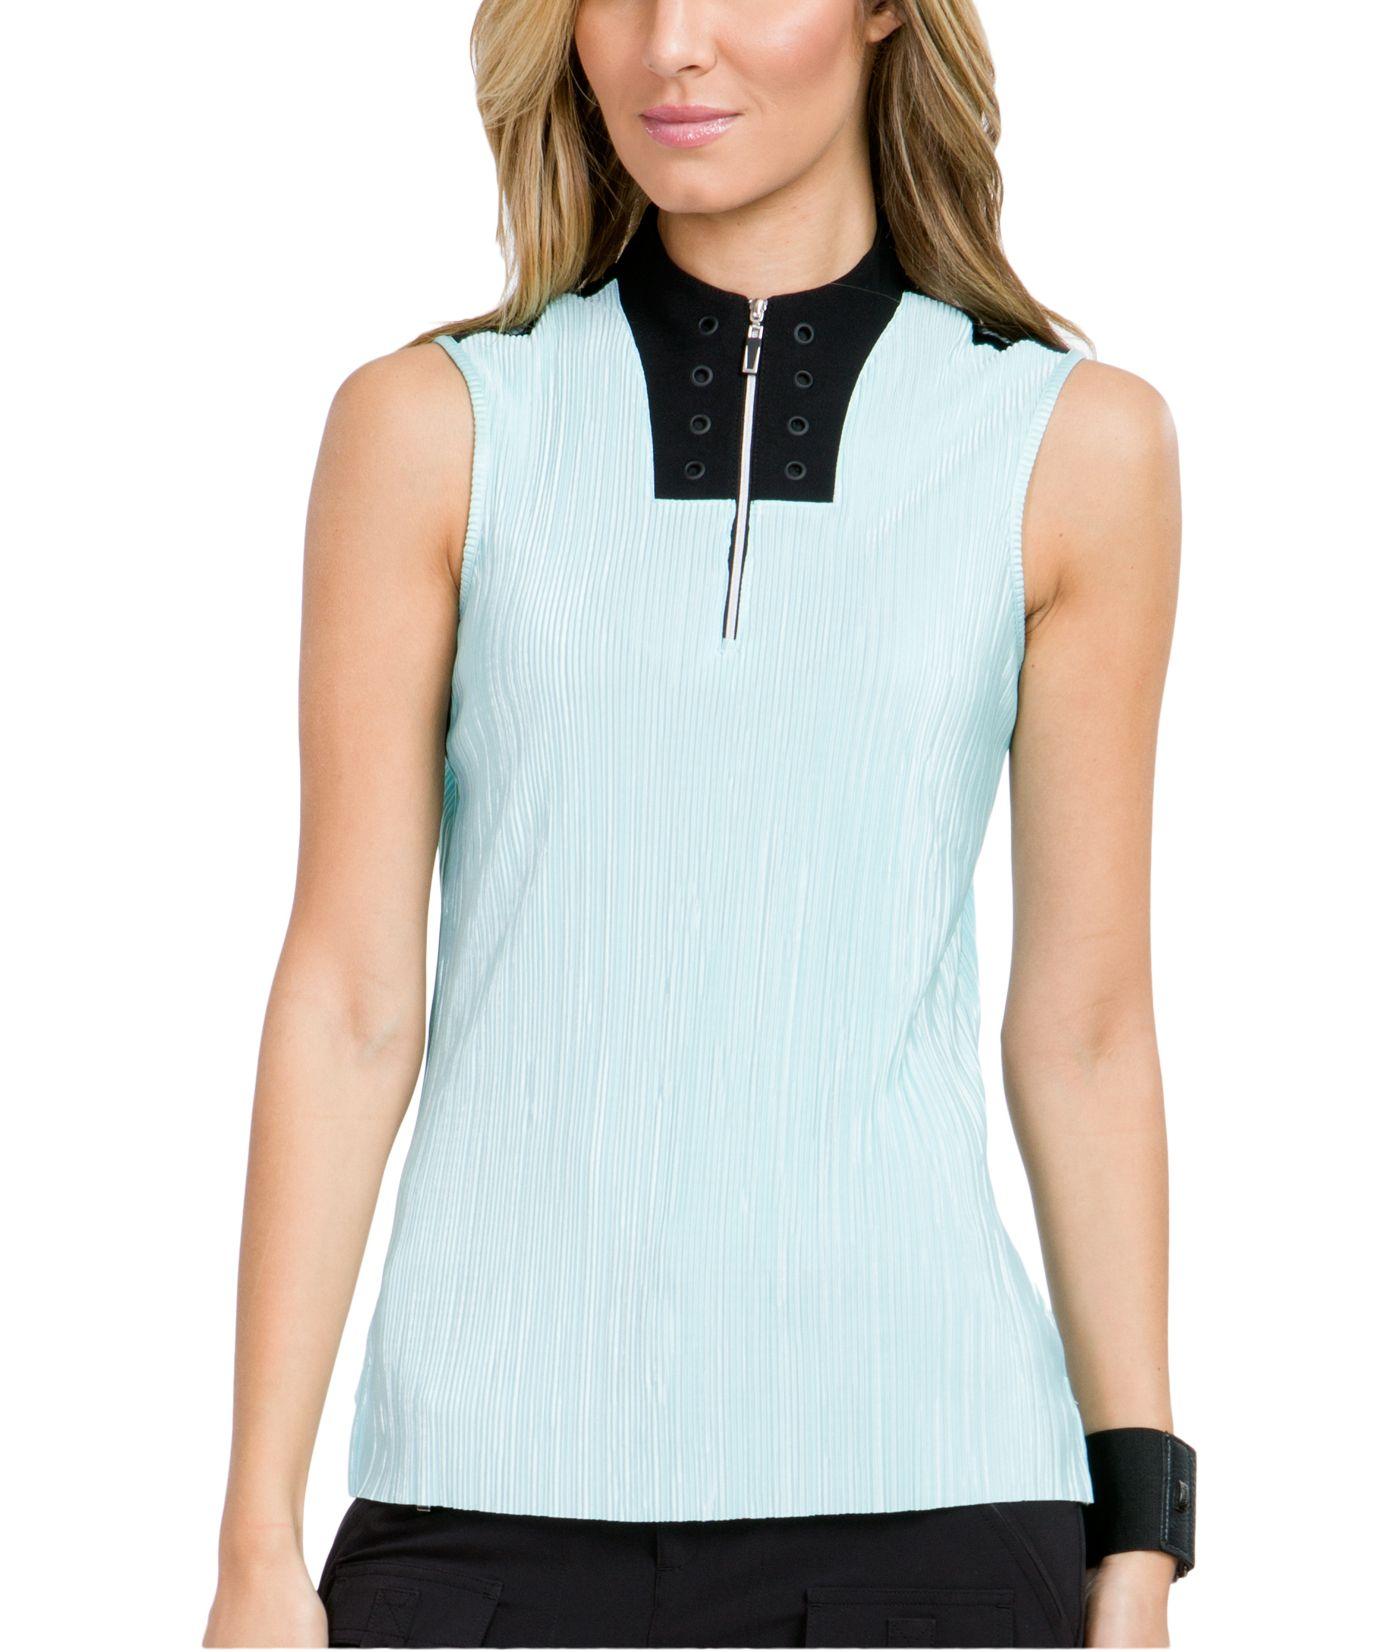 Jamie Sadock Women's Color Blocked Sleeveless Golf Top